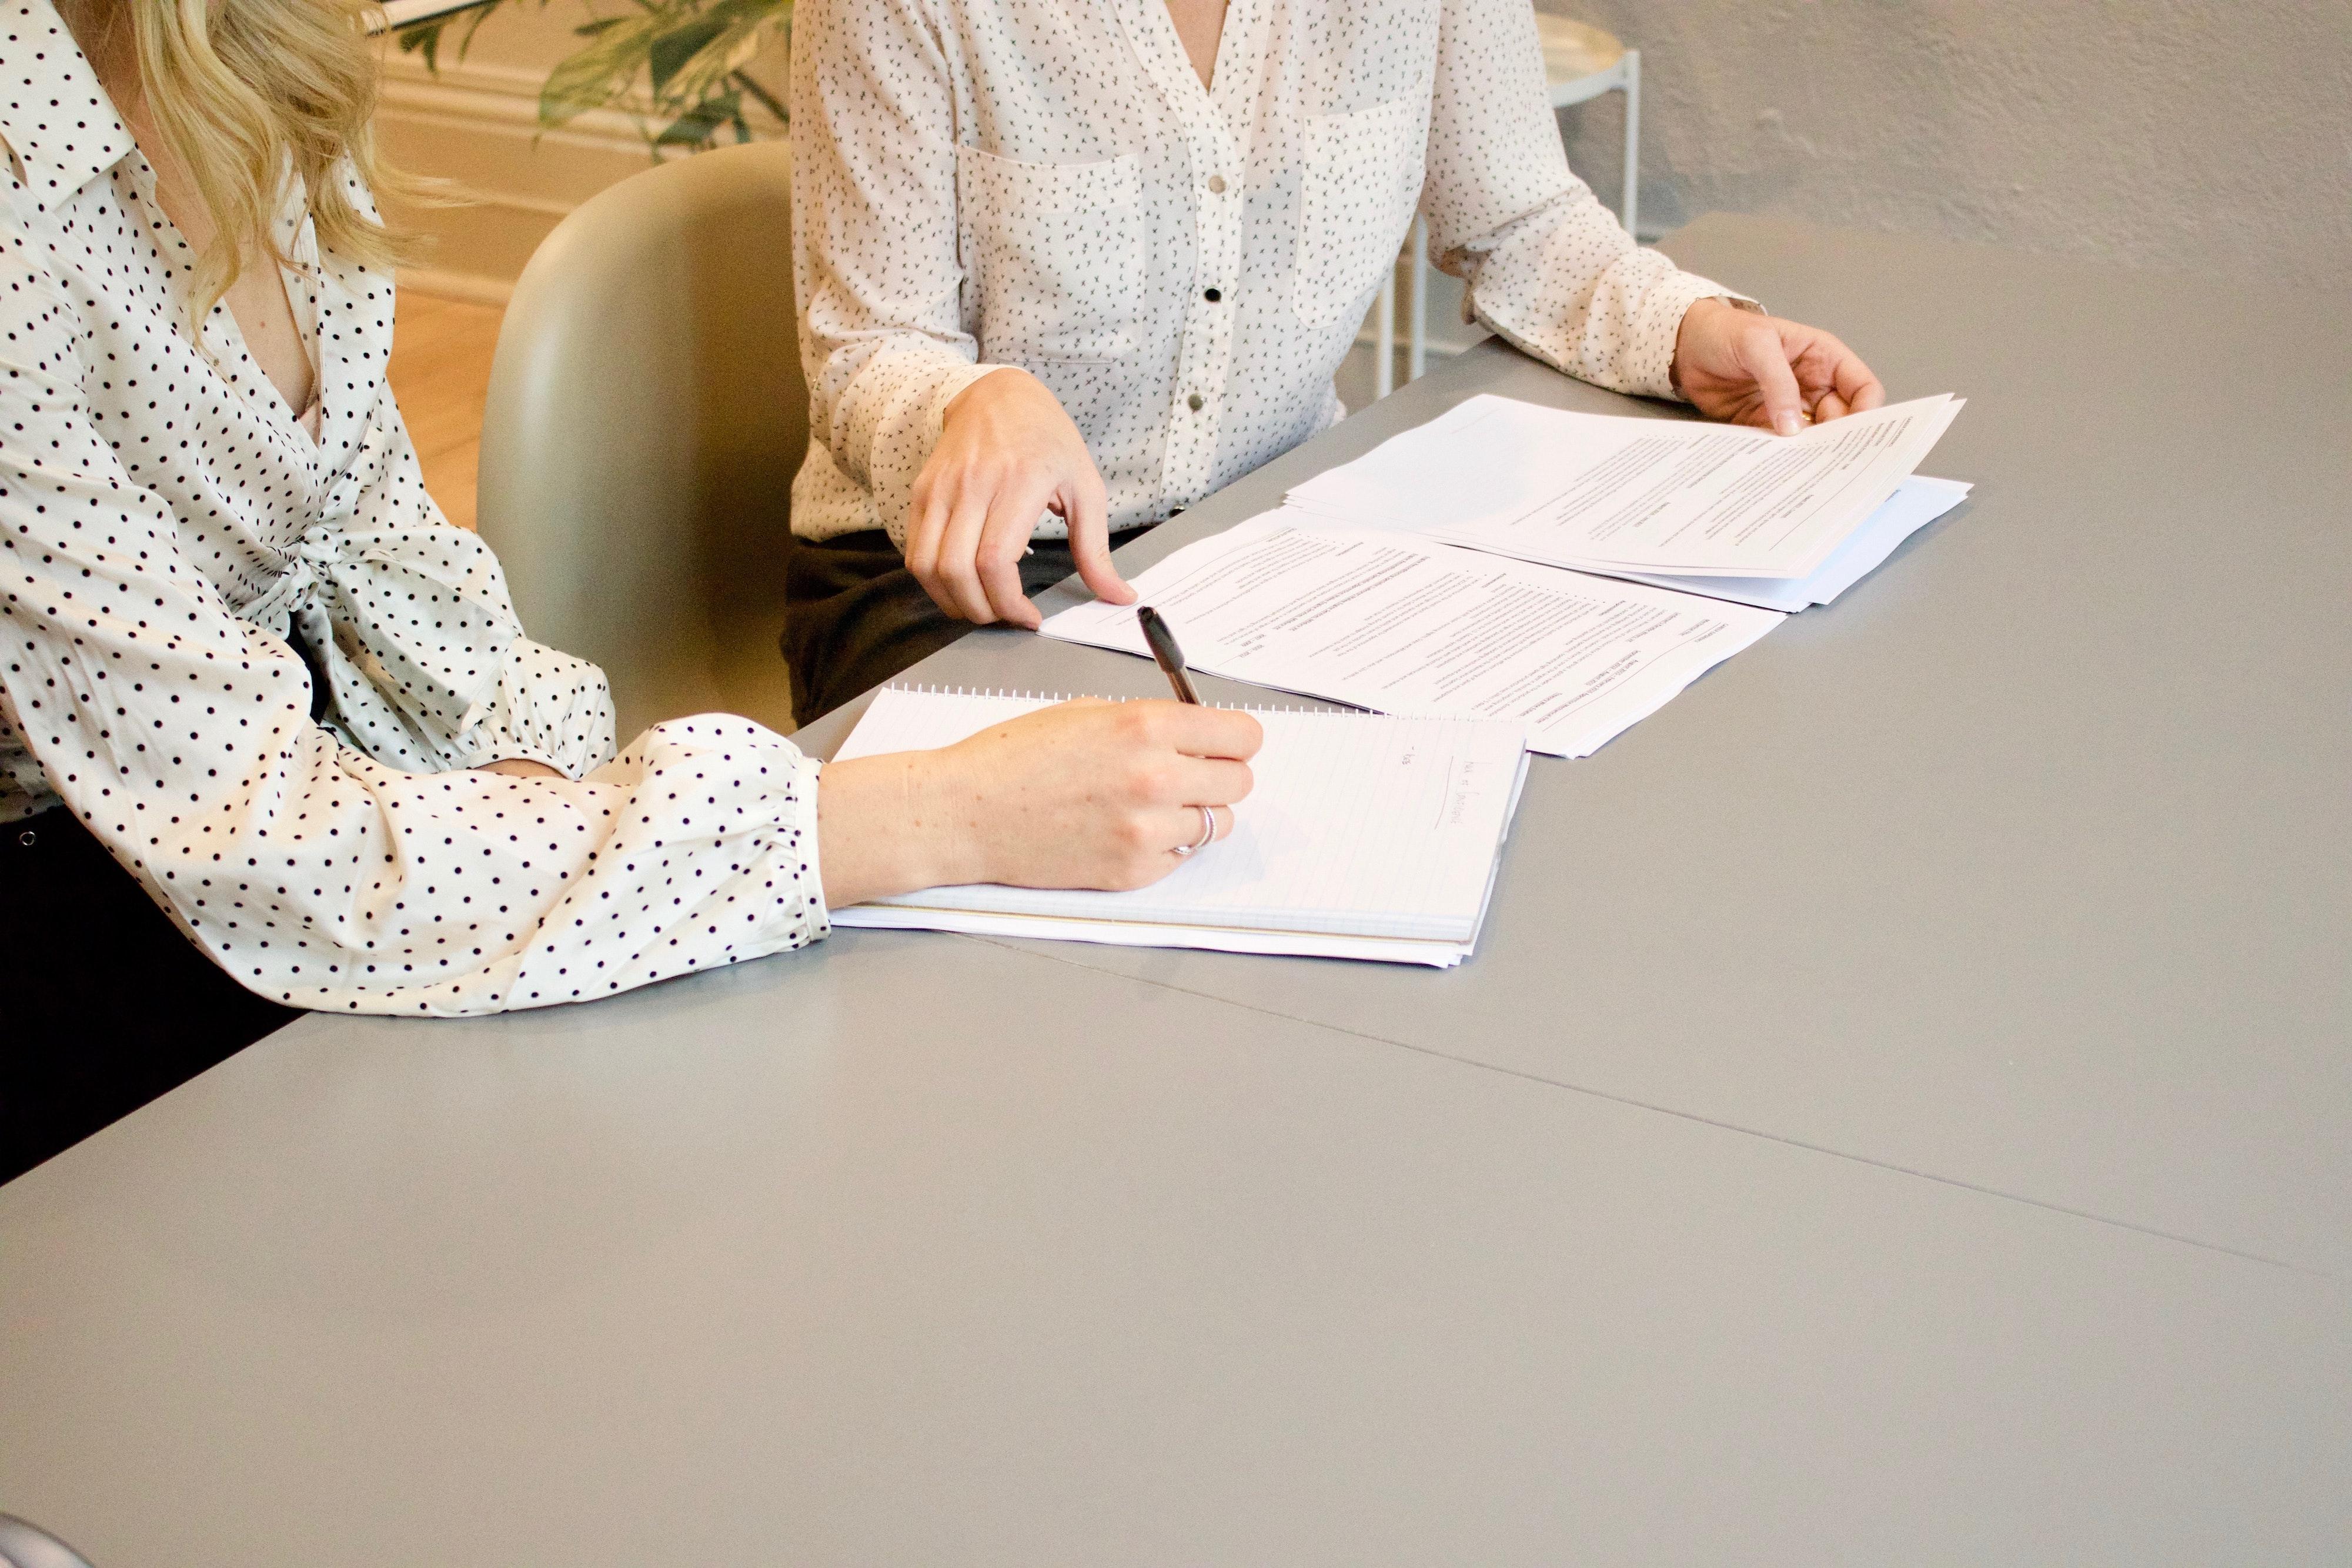 Should an employer give an employee a written contract?